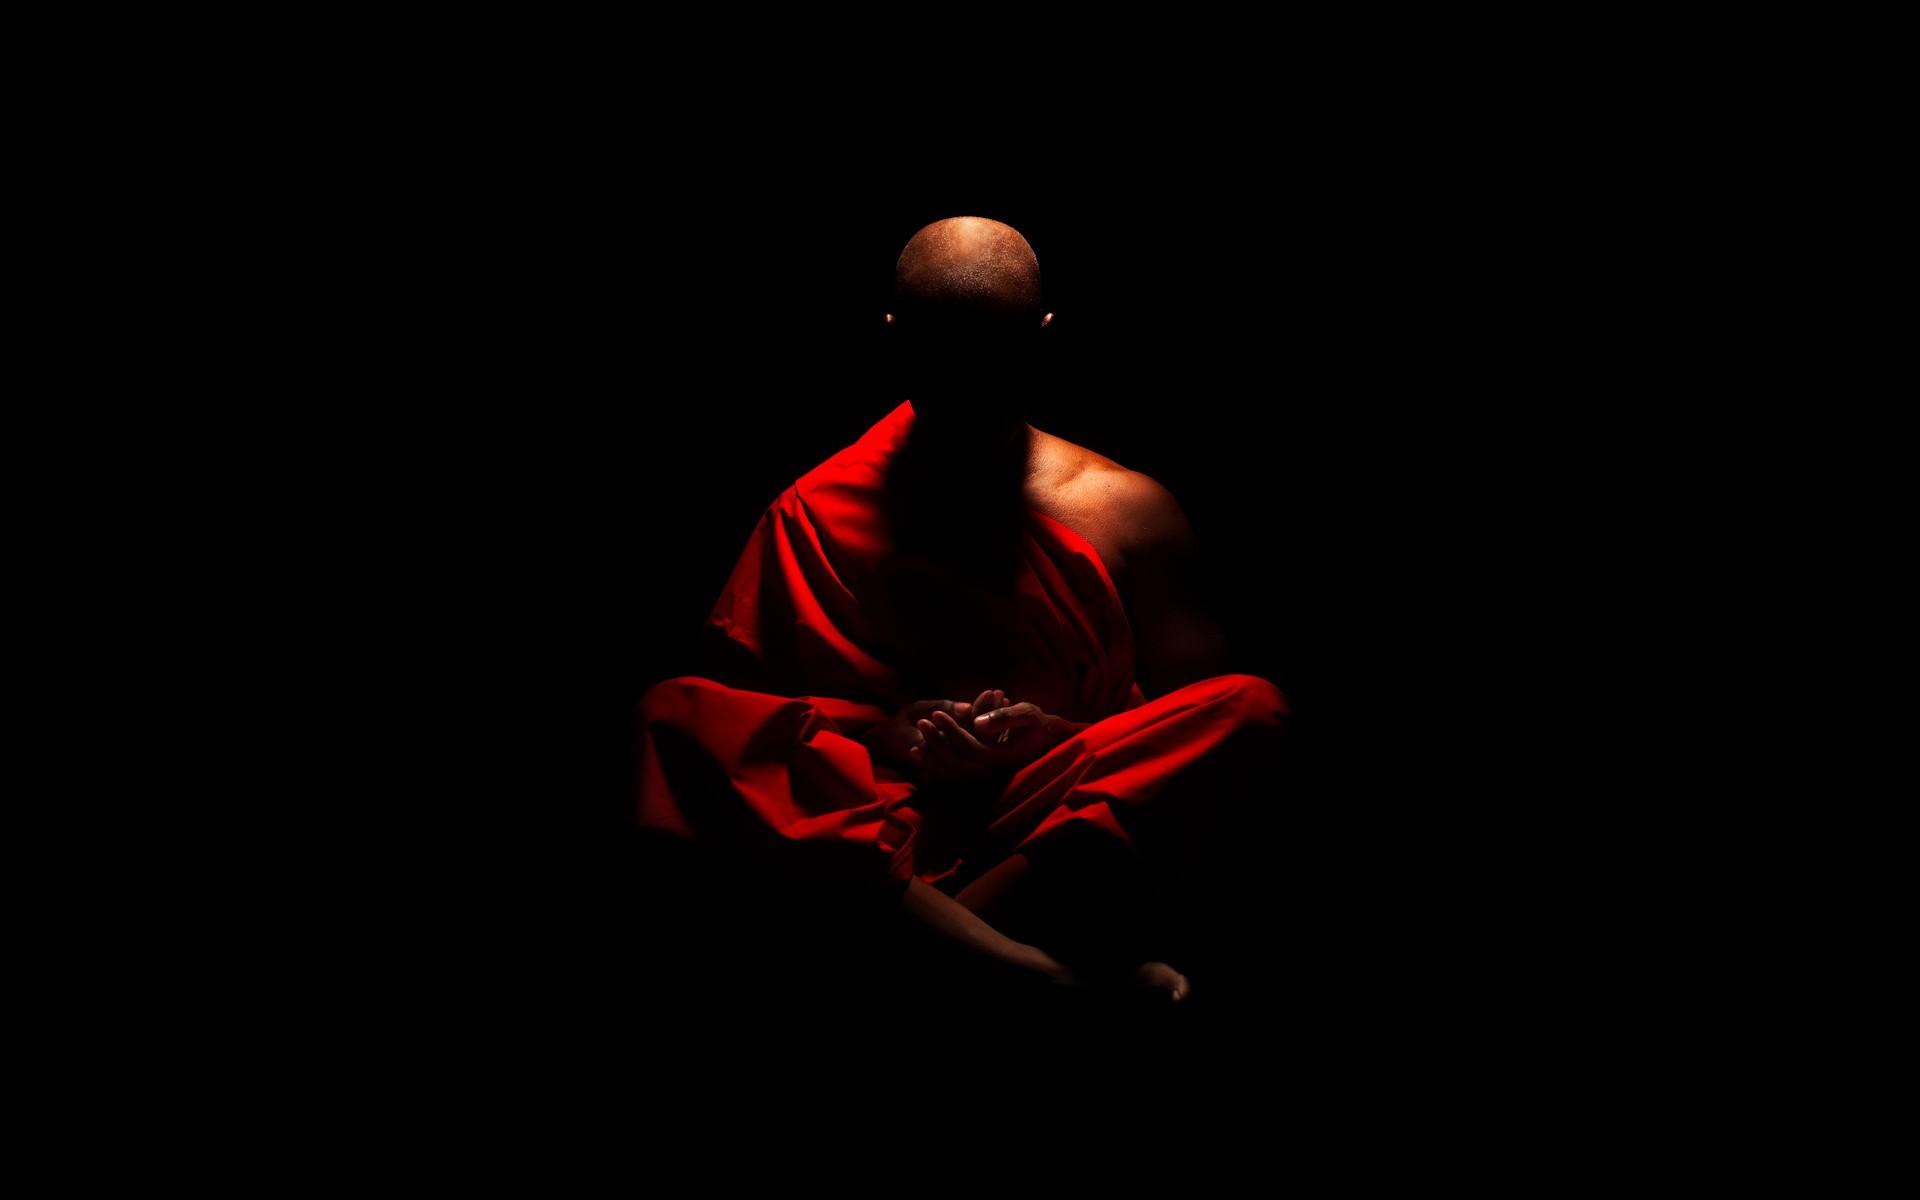 dark-head-Tibet-warriors-monk-martial-arts-meditation-black-background-shaolin-_15982-58